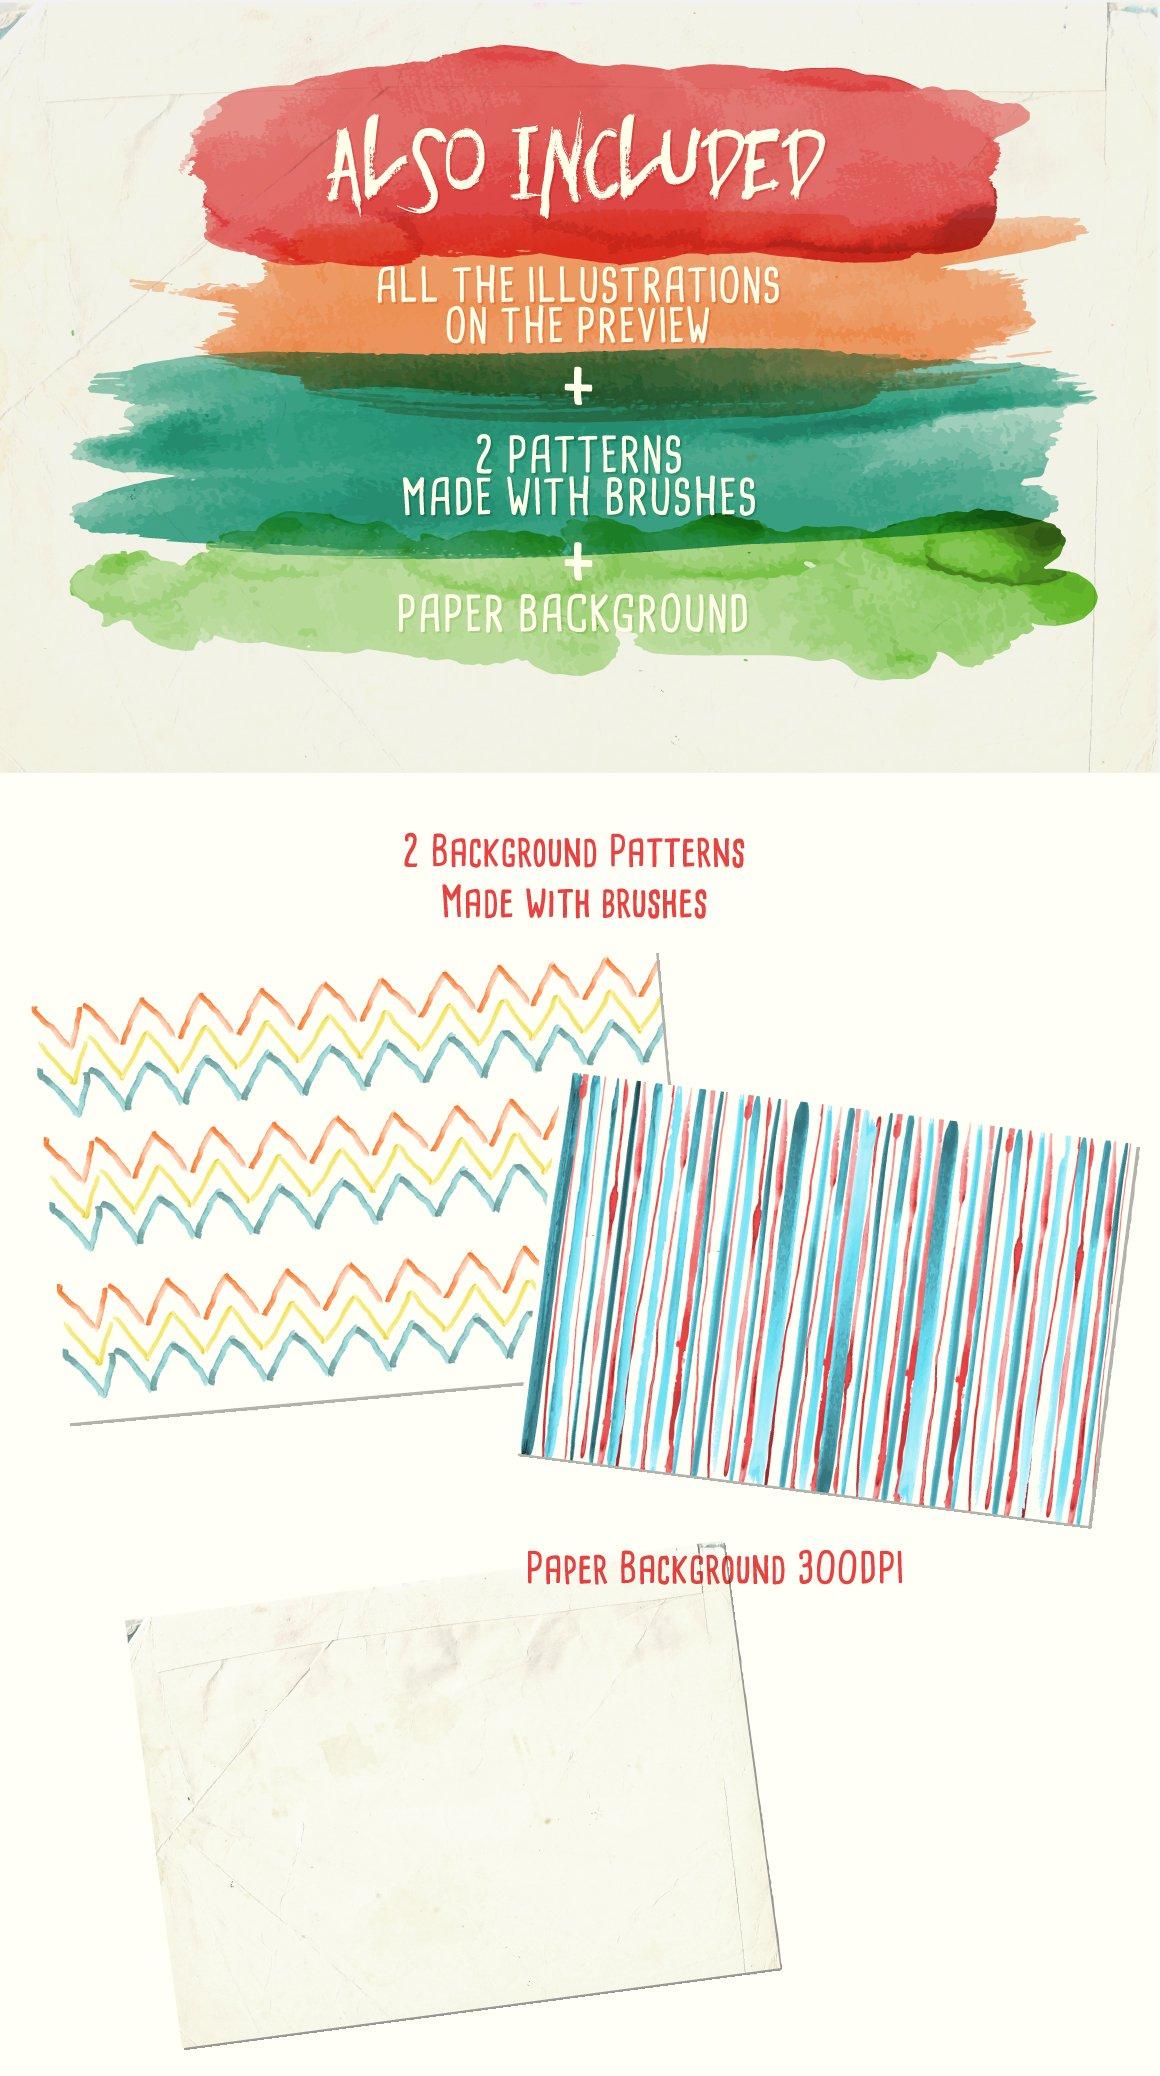 94款手绘水彩矢量艺术笔刷背景纹理 Watercolor Vector Art Brushes插图(2)